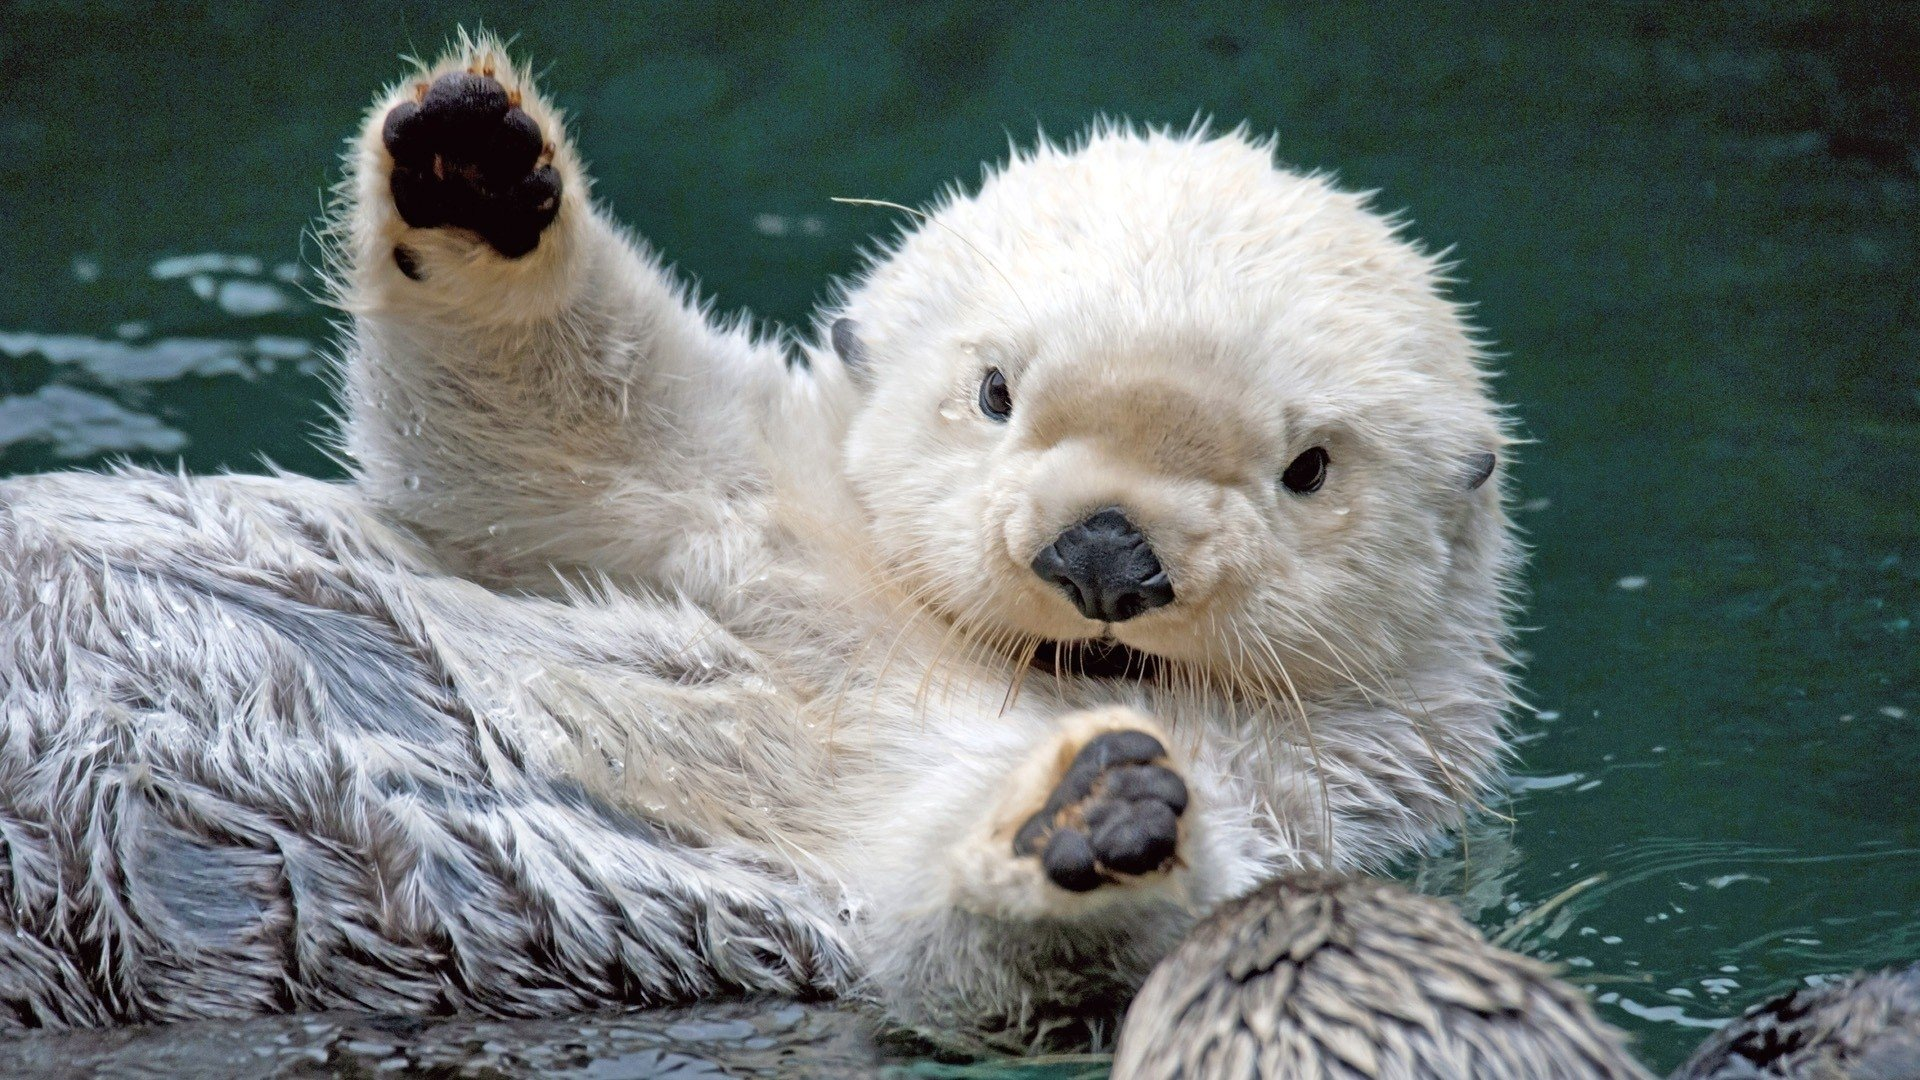 Cute Otter Wallpaper Otter Full Hd Wallpaper And Hintergrund 1920x1080 Id